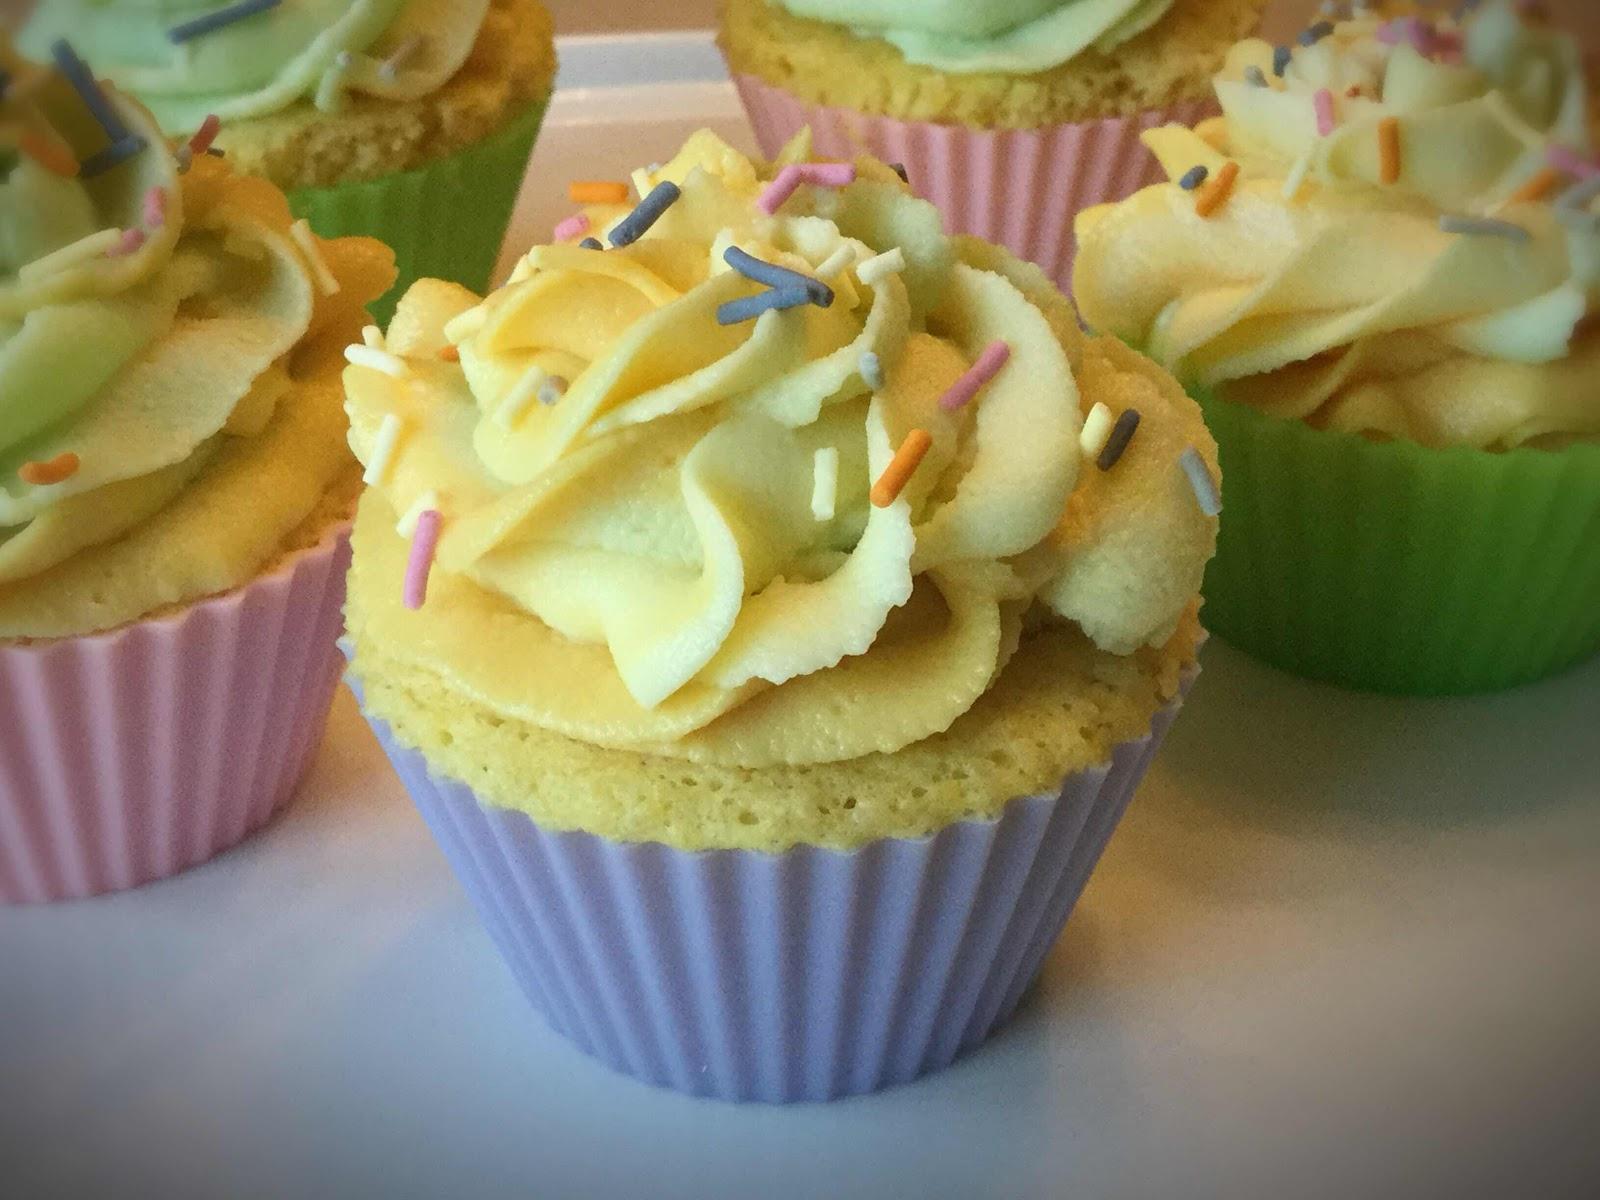 40 Second Keto Lemon Cupcakes